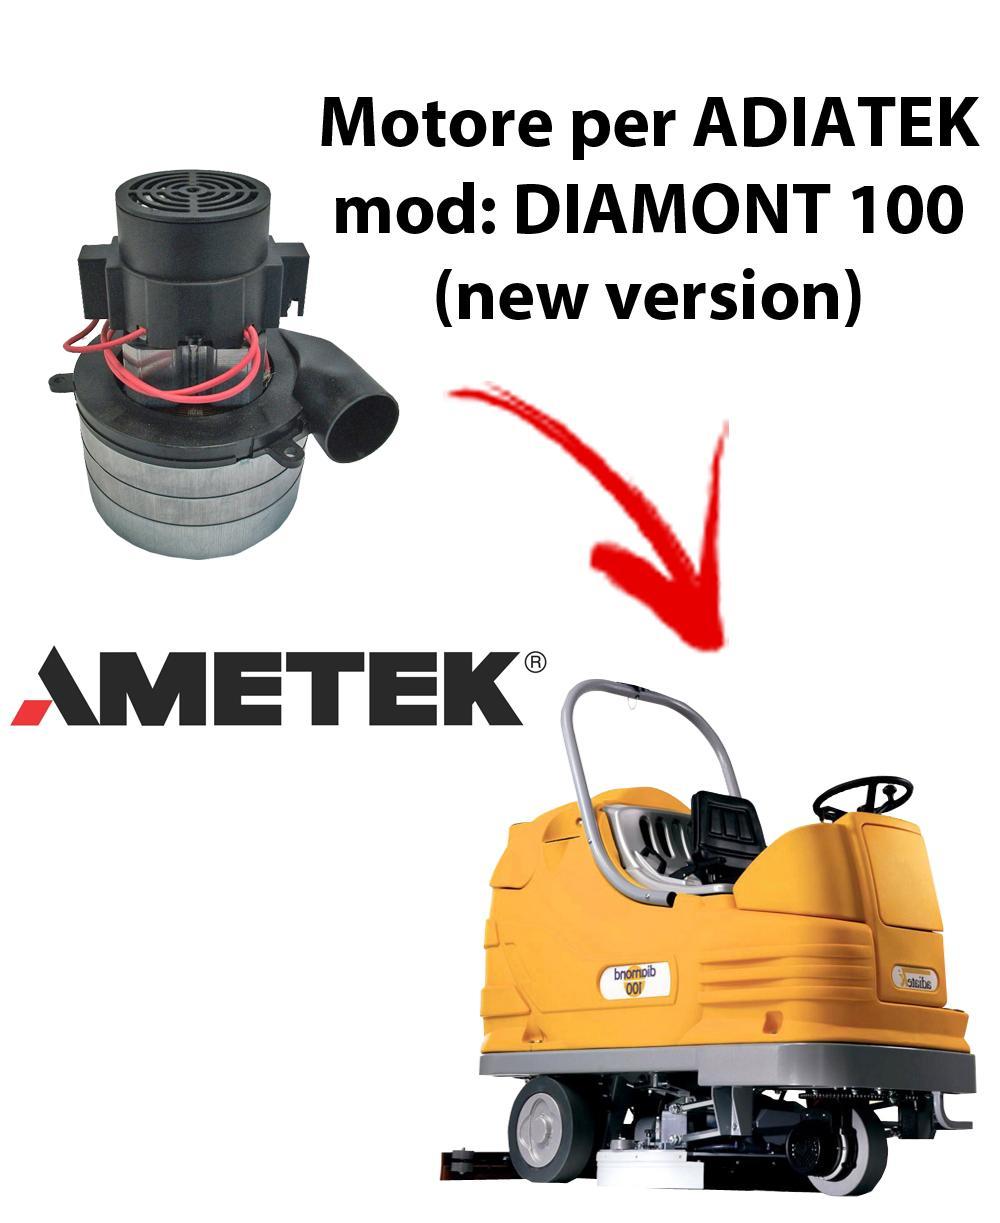 Adiatek Diamond 100 New Version Motore Di Aspirazione